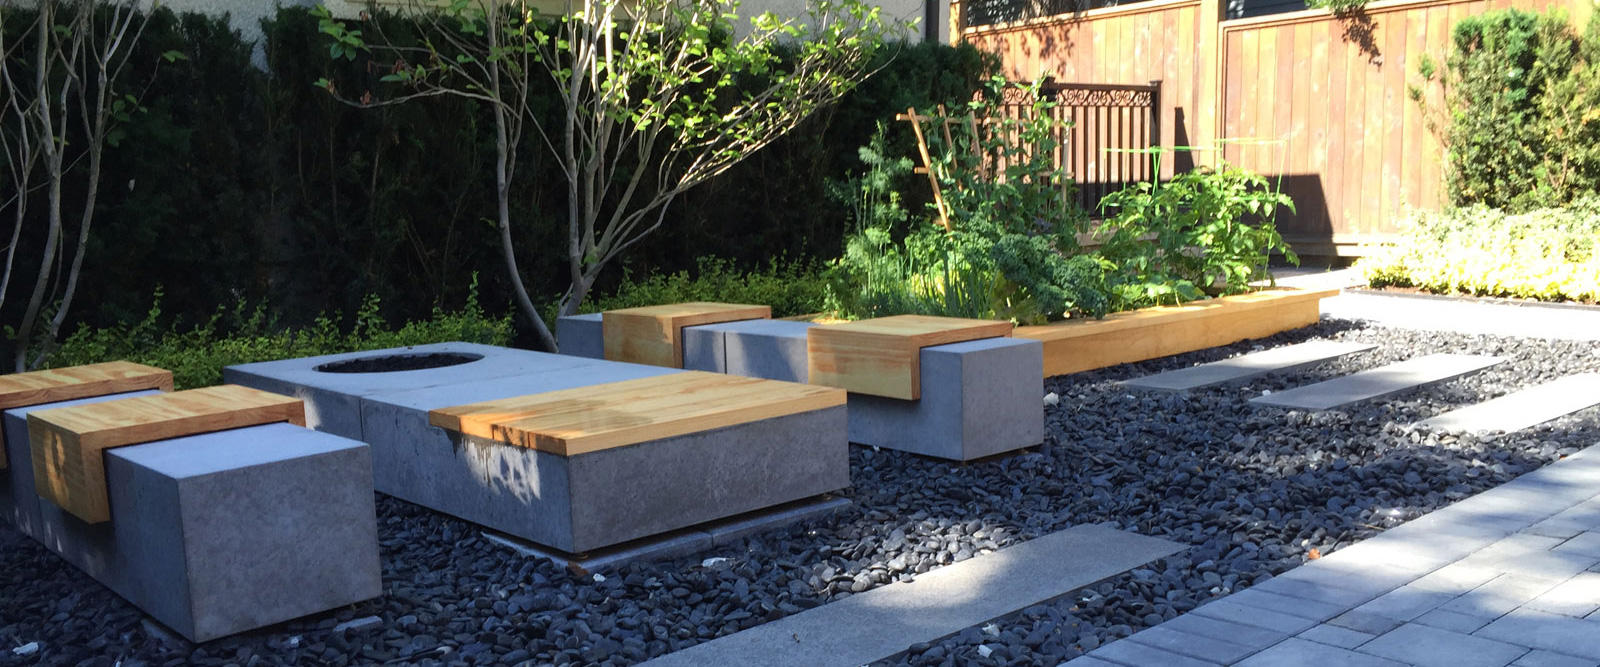 landscaping contractors vancouver, commercial lawn maintenance companies vancouver